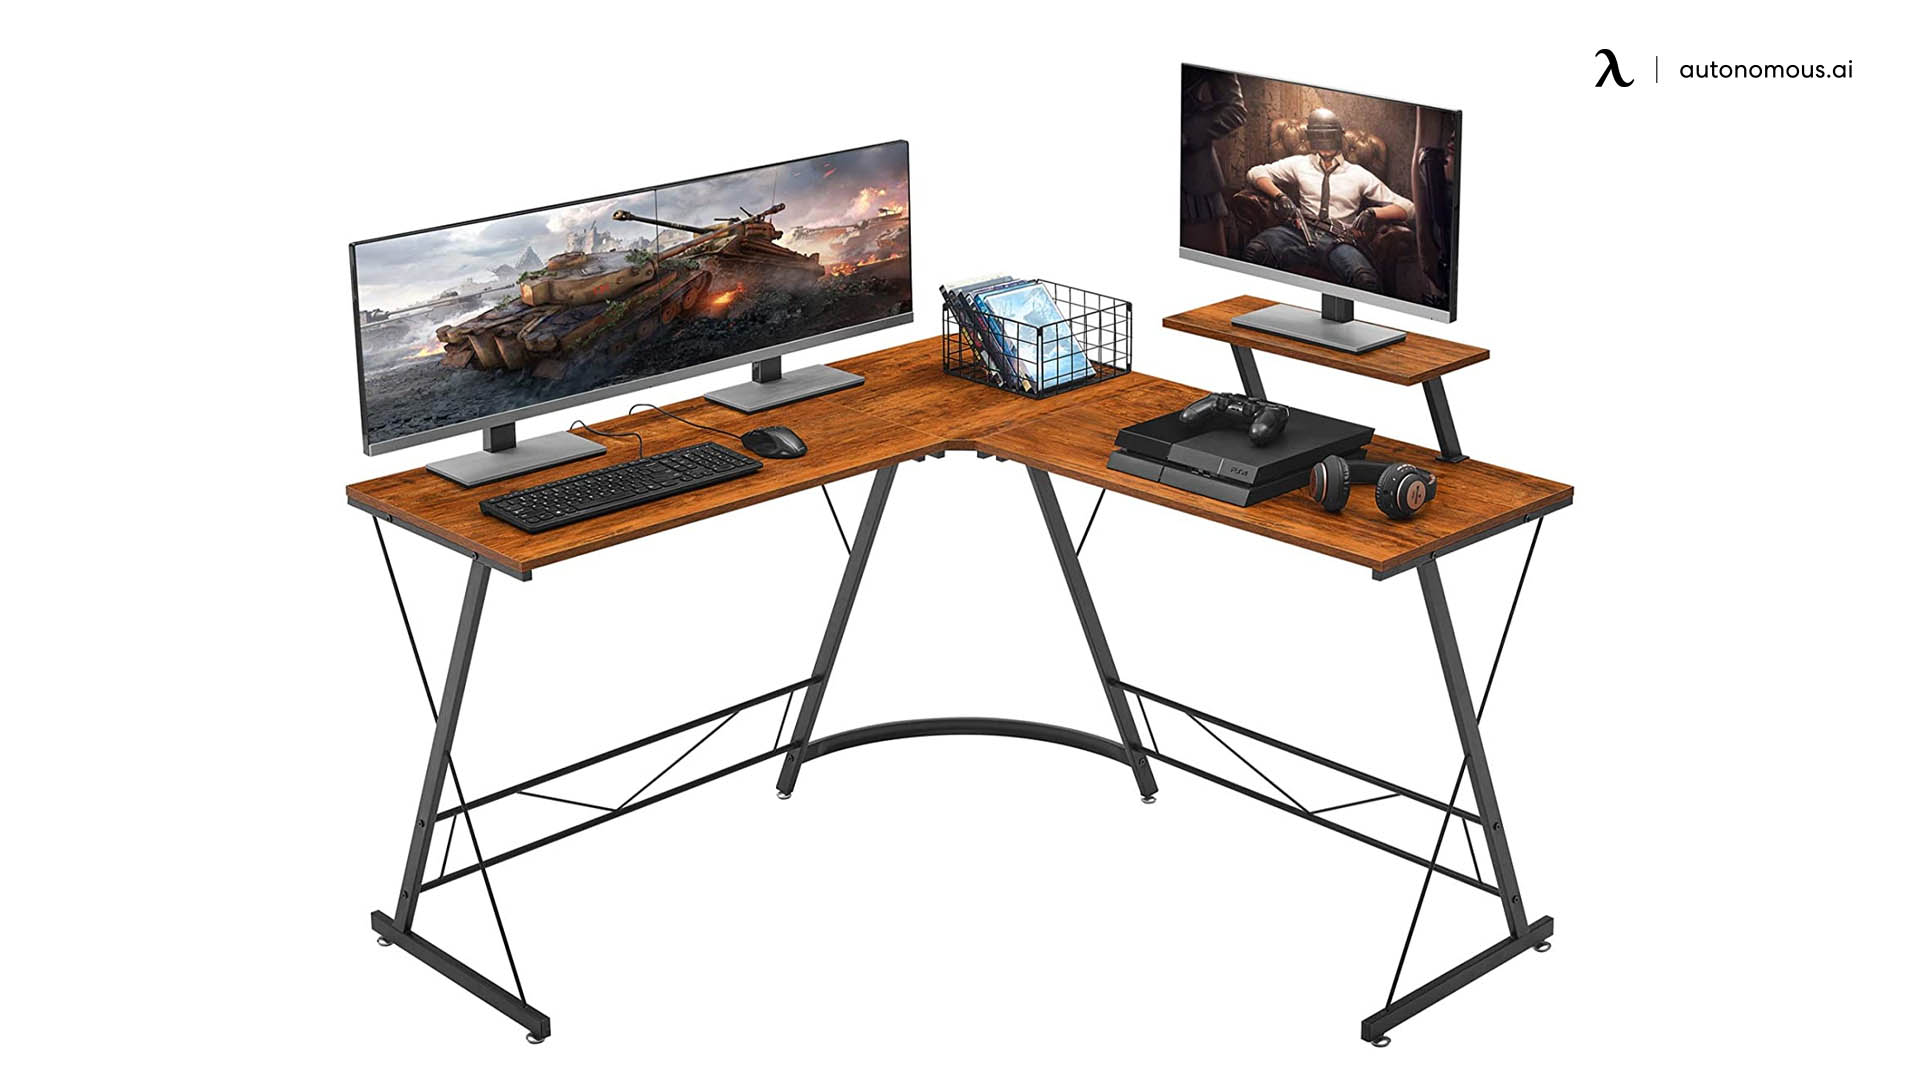 ironstone l-shaped gaming desk